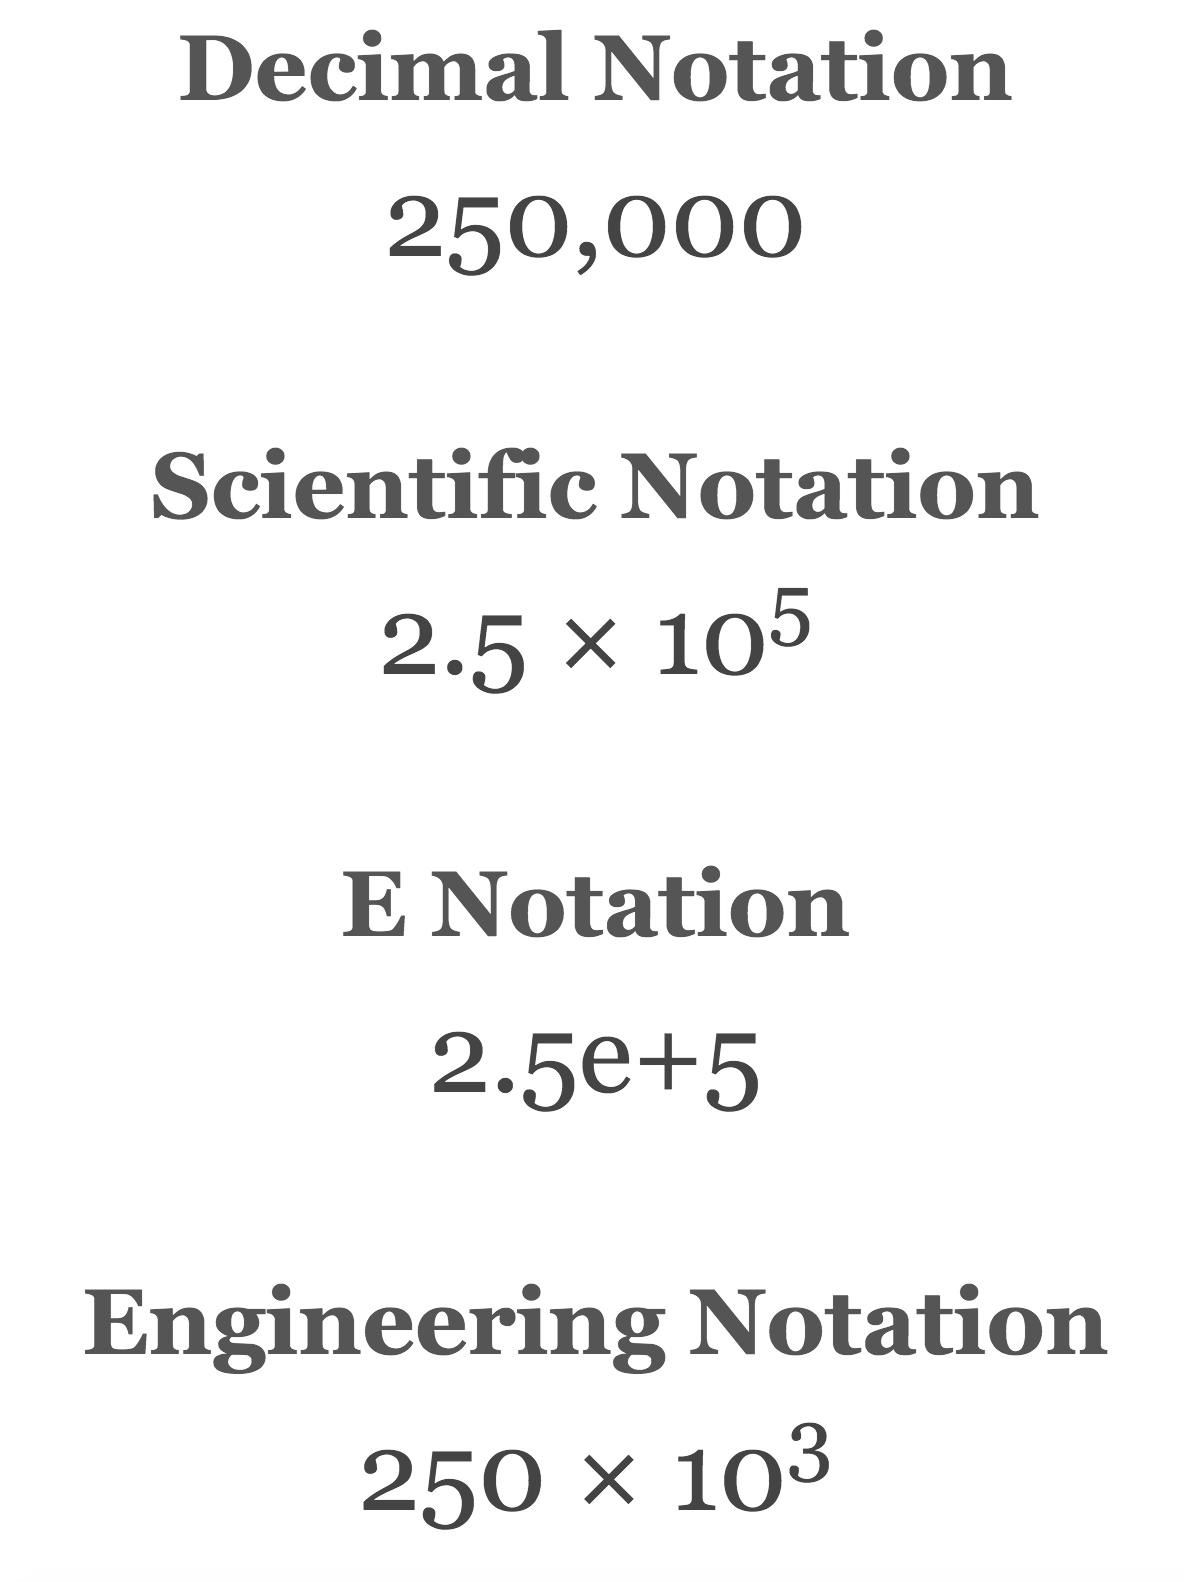 Scientific Notation Calculator And Decimal Conversion